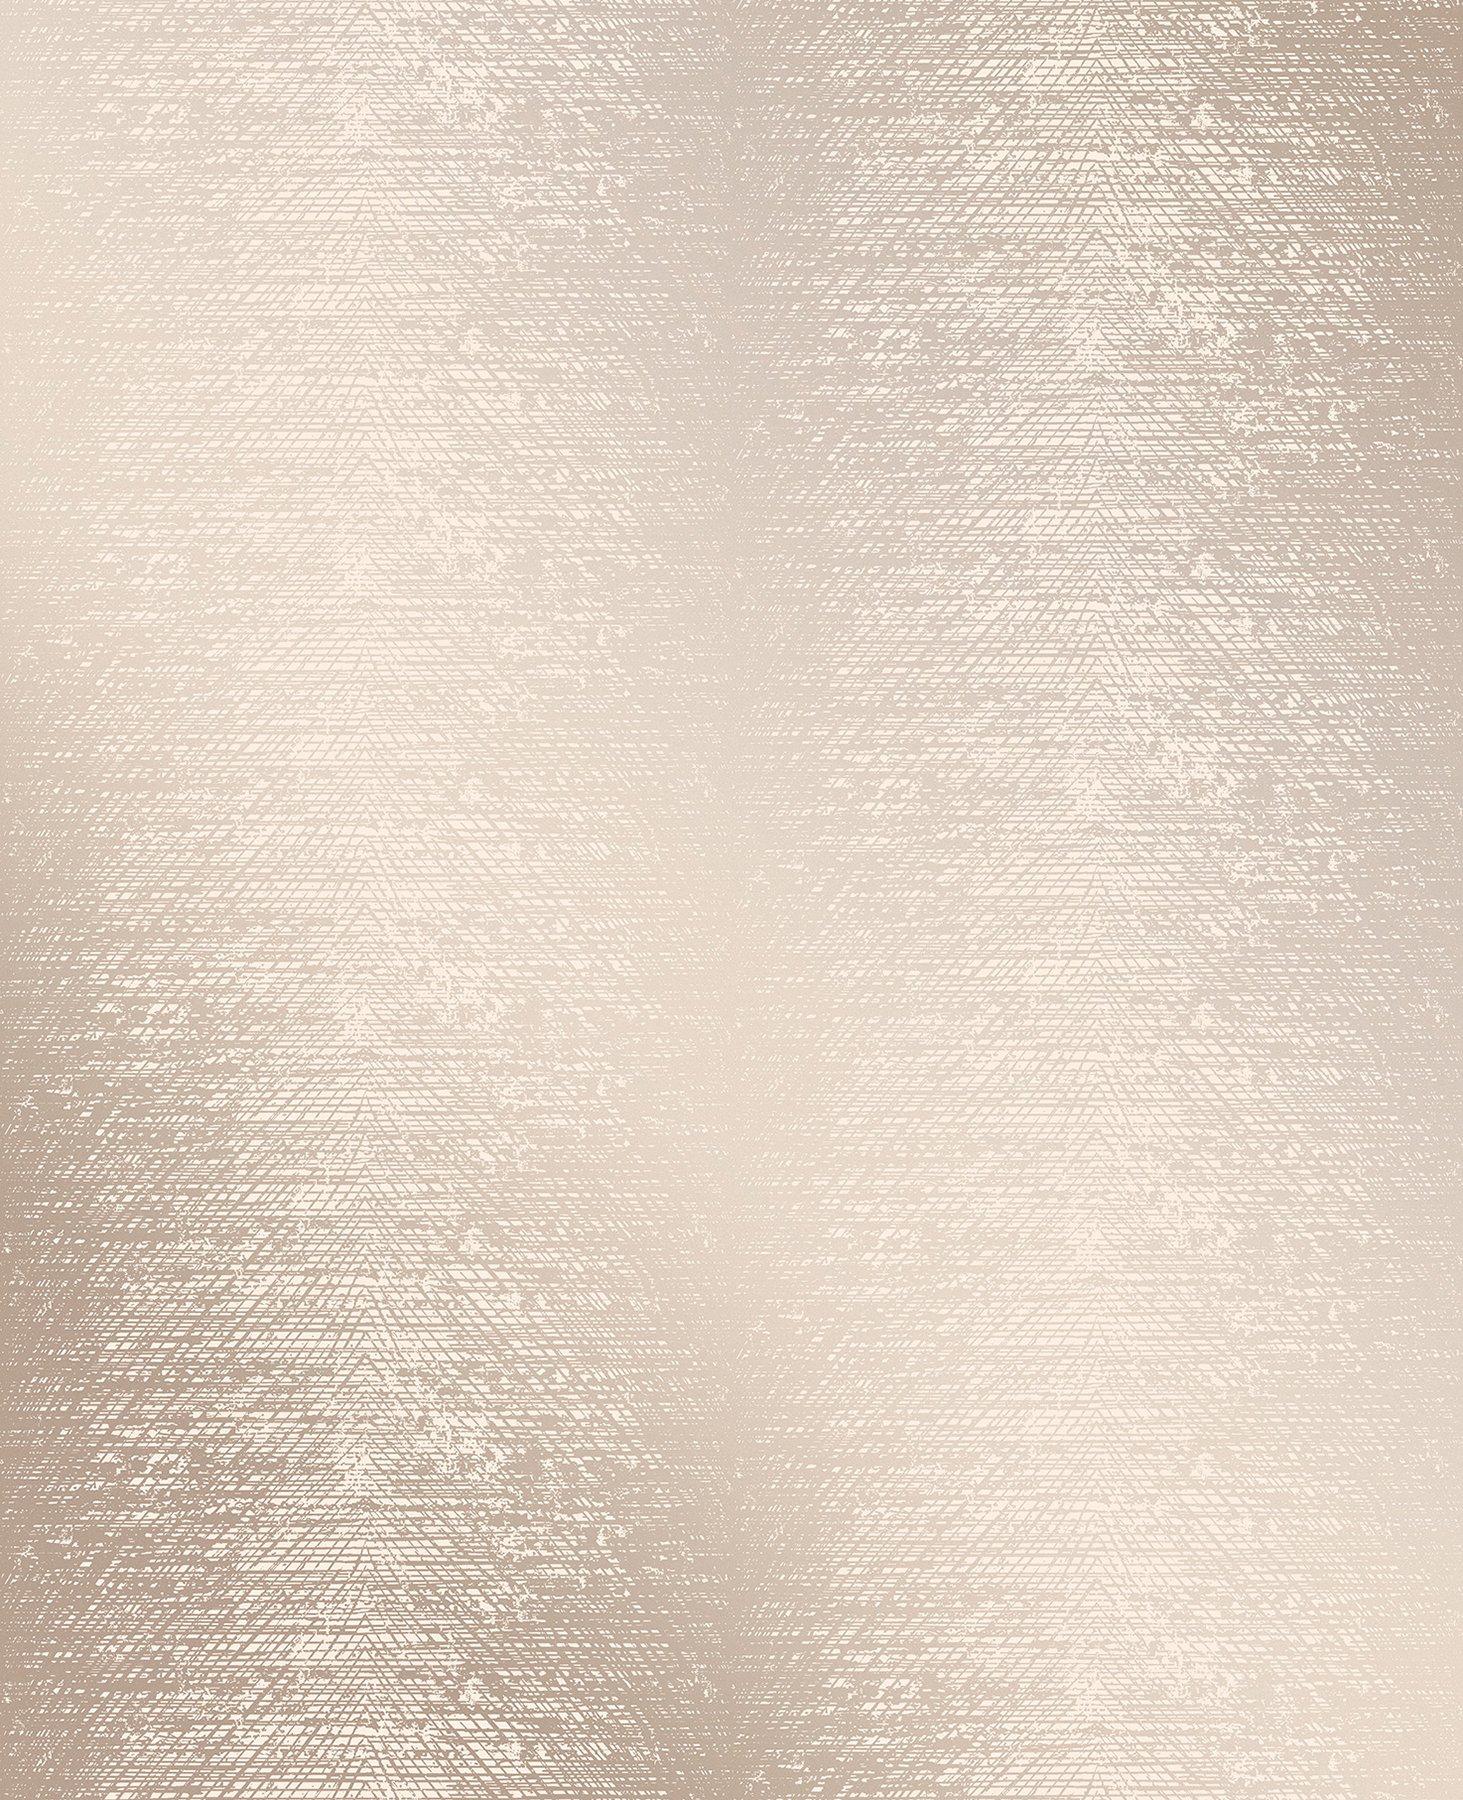 Decorline 2735-23335 Waukegan Bronze Mia Ombre Wallpaper Waukegan Mia Ombre Wallpaper